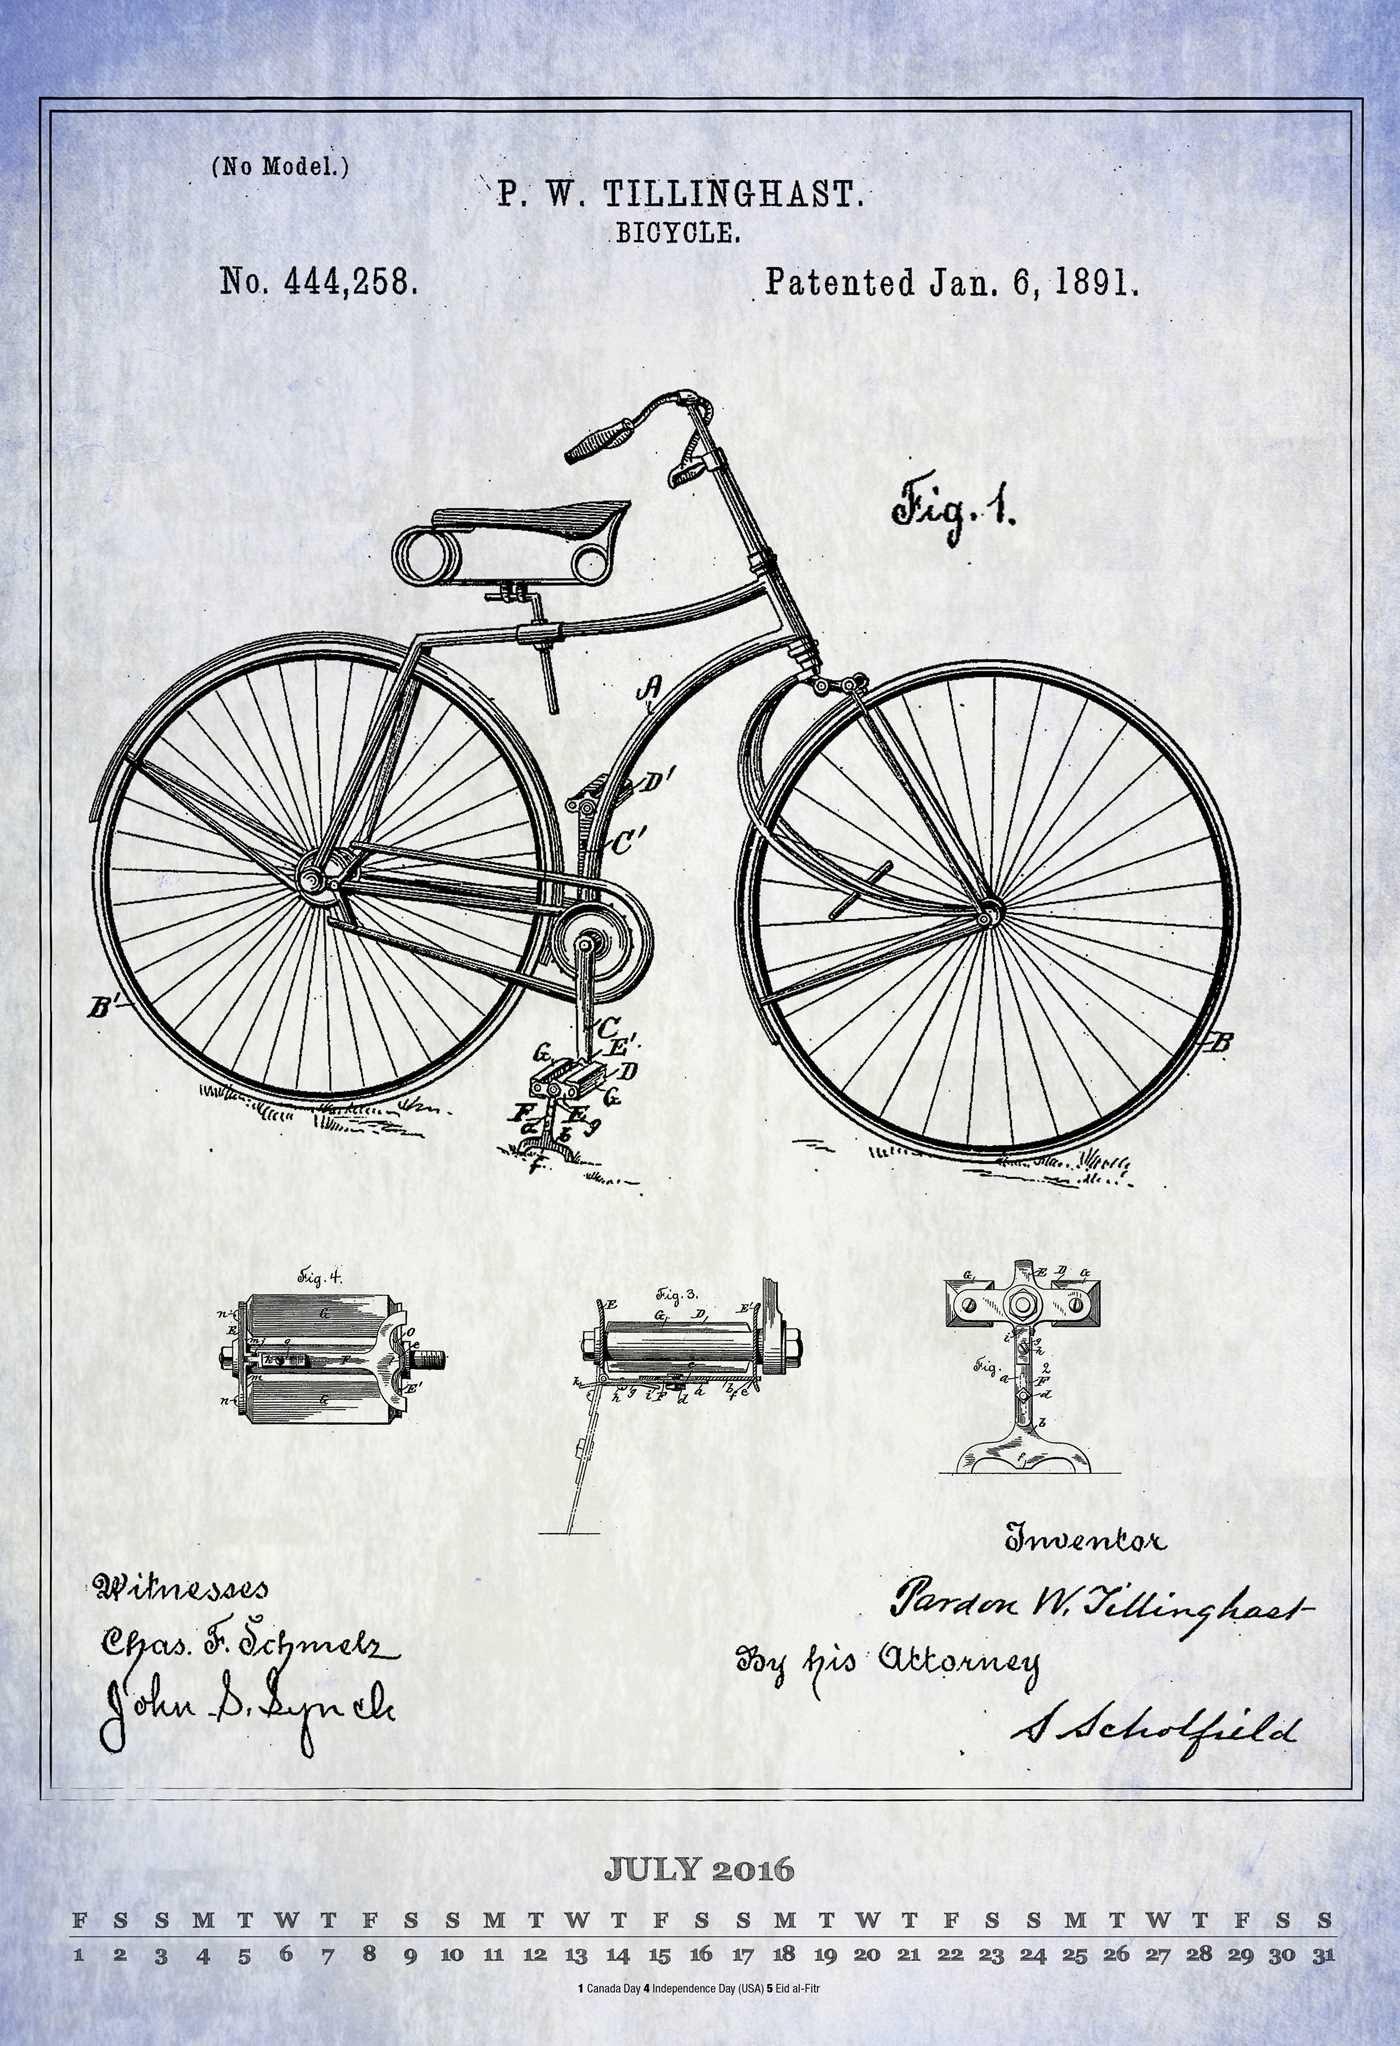 Vintage Patent Blueprints 2016 Poster Ca: Amazon.es: Andrews ...